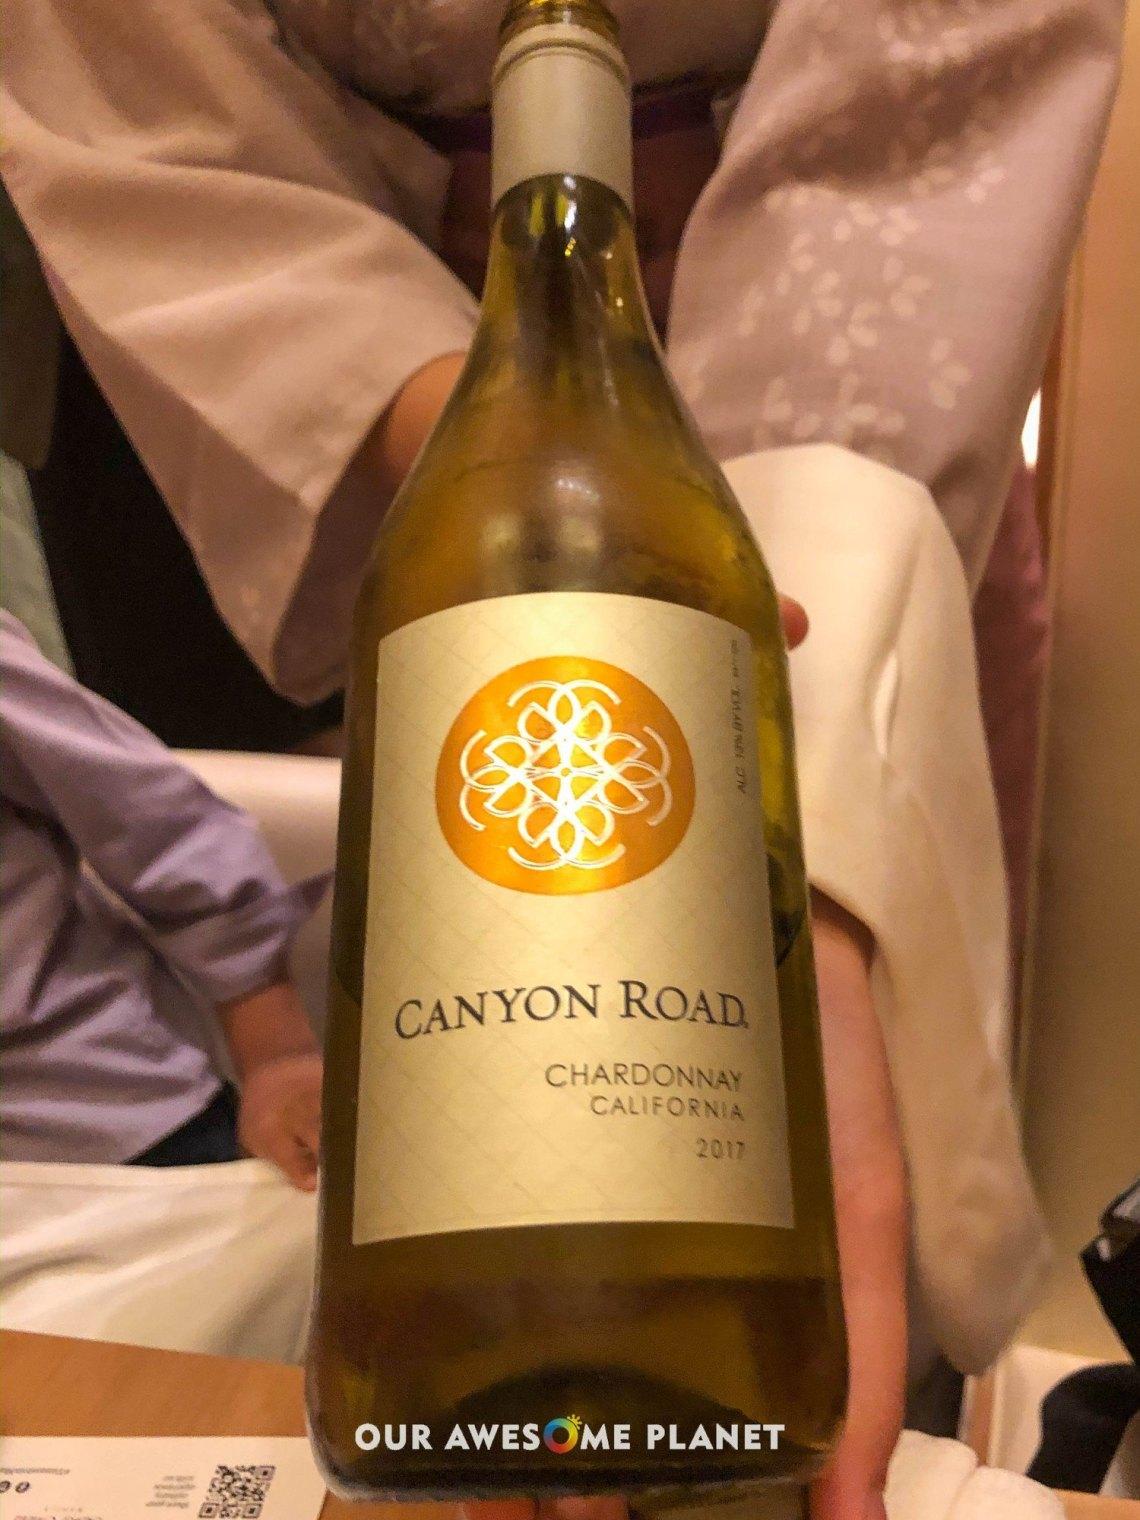 Canyon Road Chardonnay